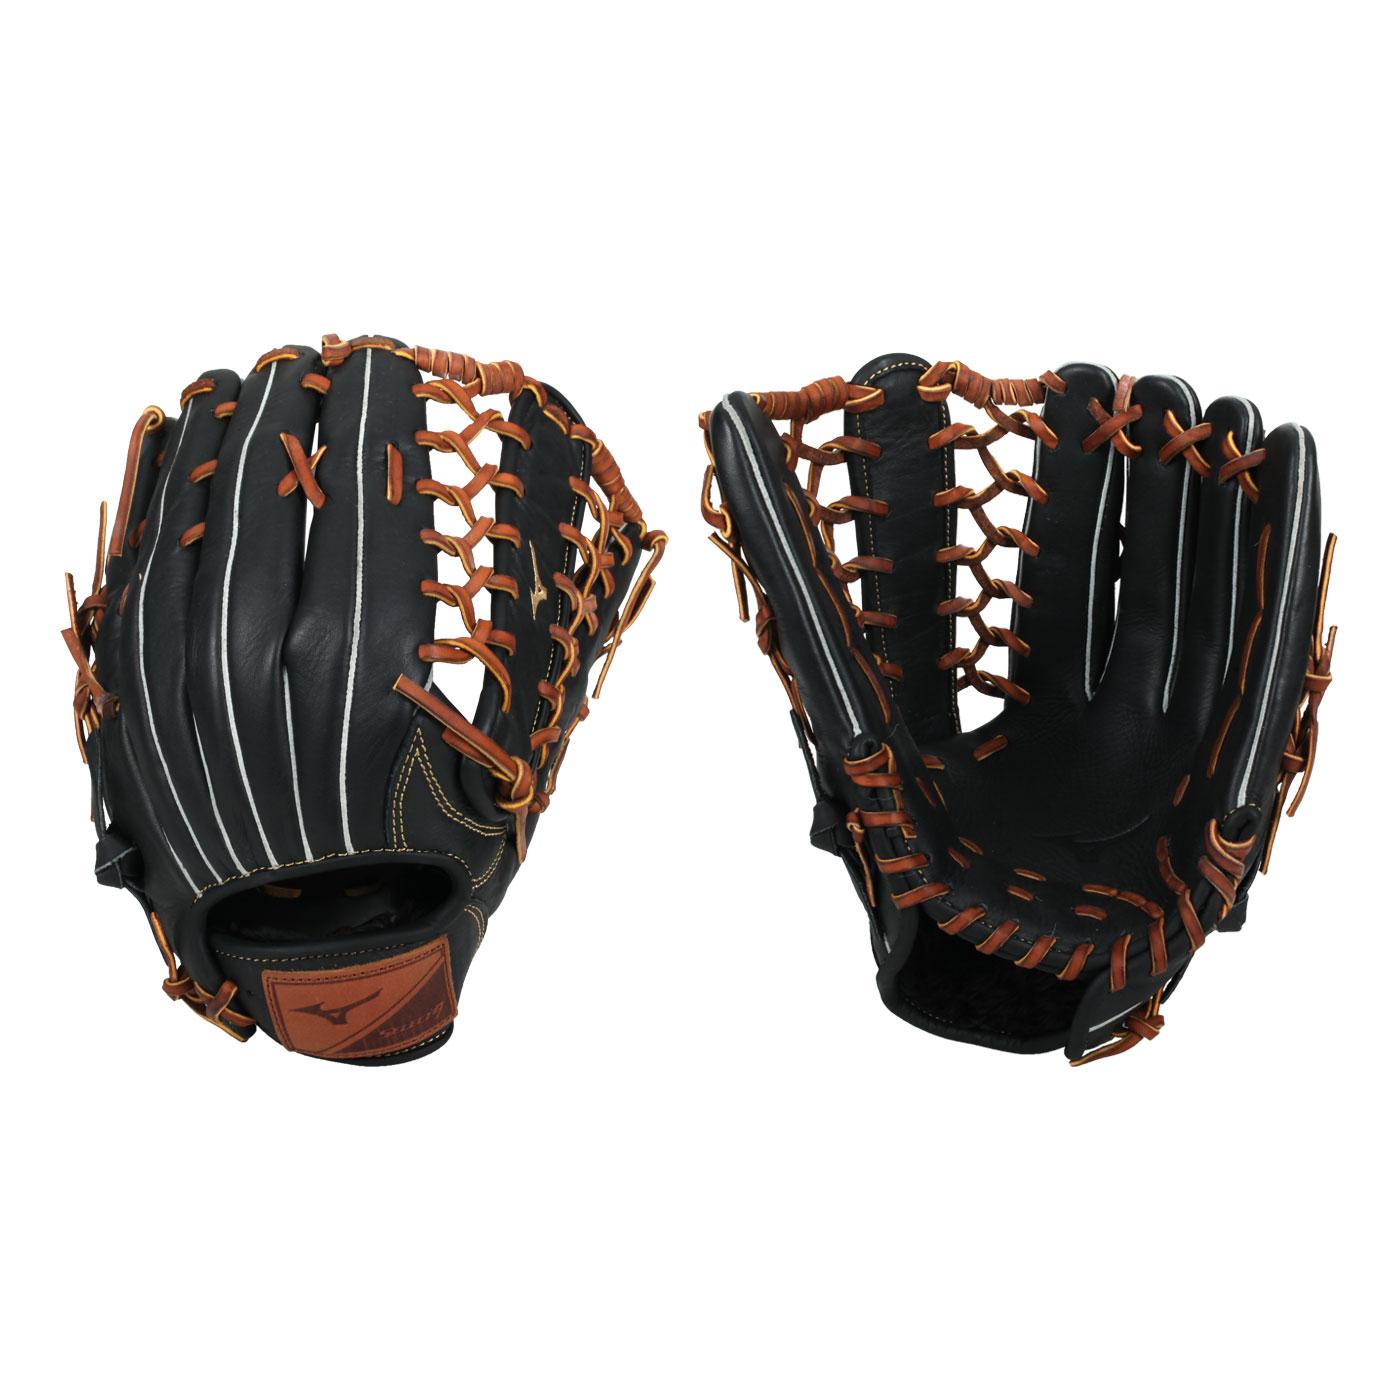 MIZUNO 棒球手套-右投 312849-R - 黑棕